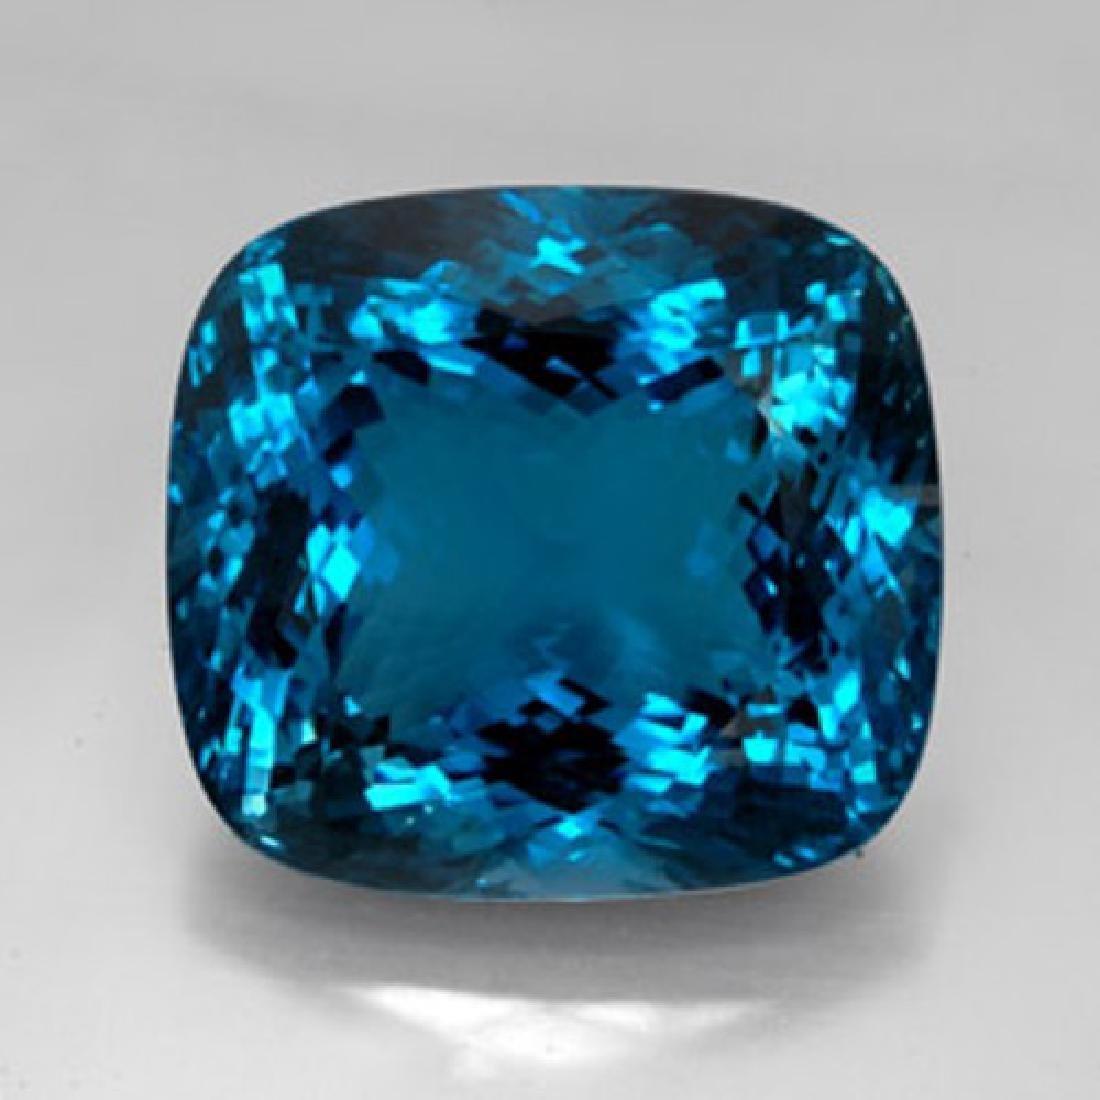 Natural London Blue Topaz 28.50 carats - VVS